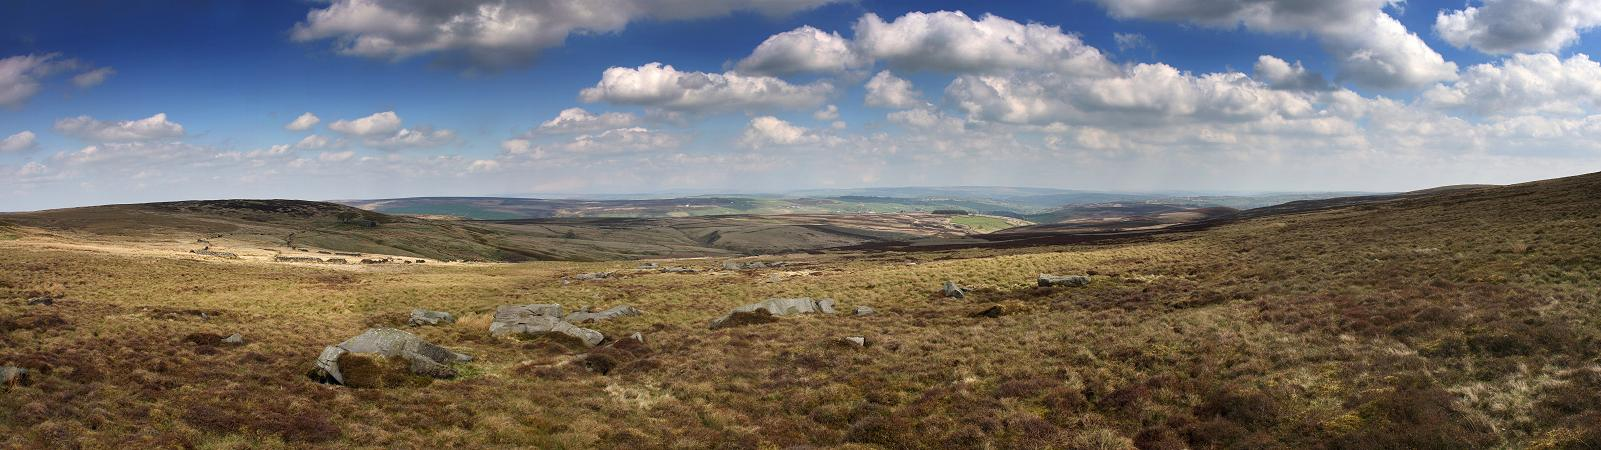 Noonan Stones panorama